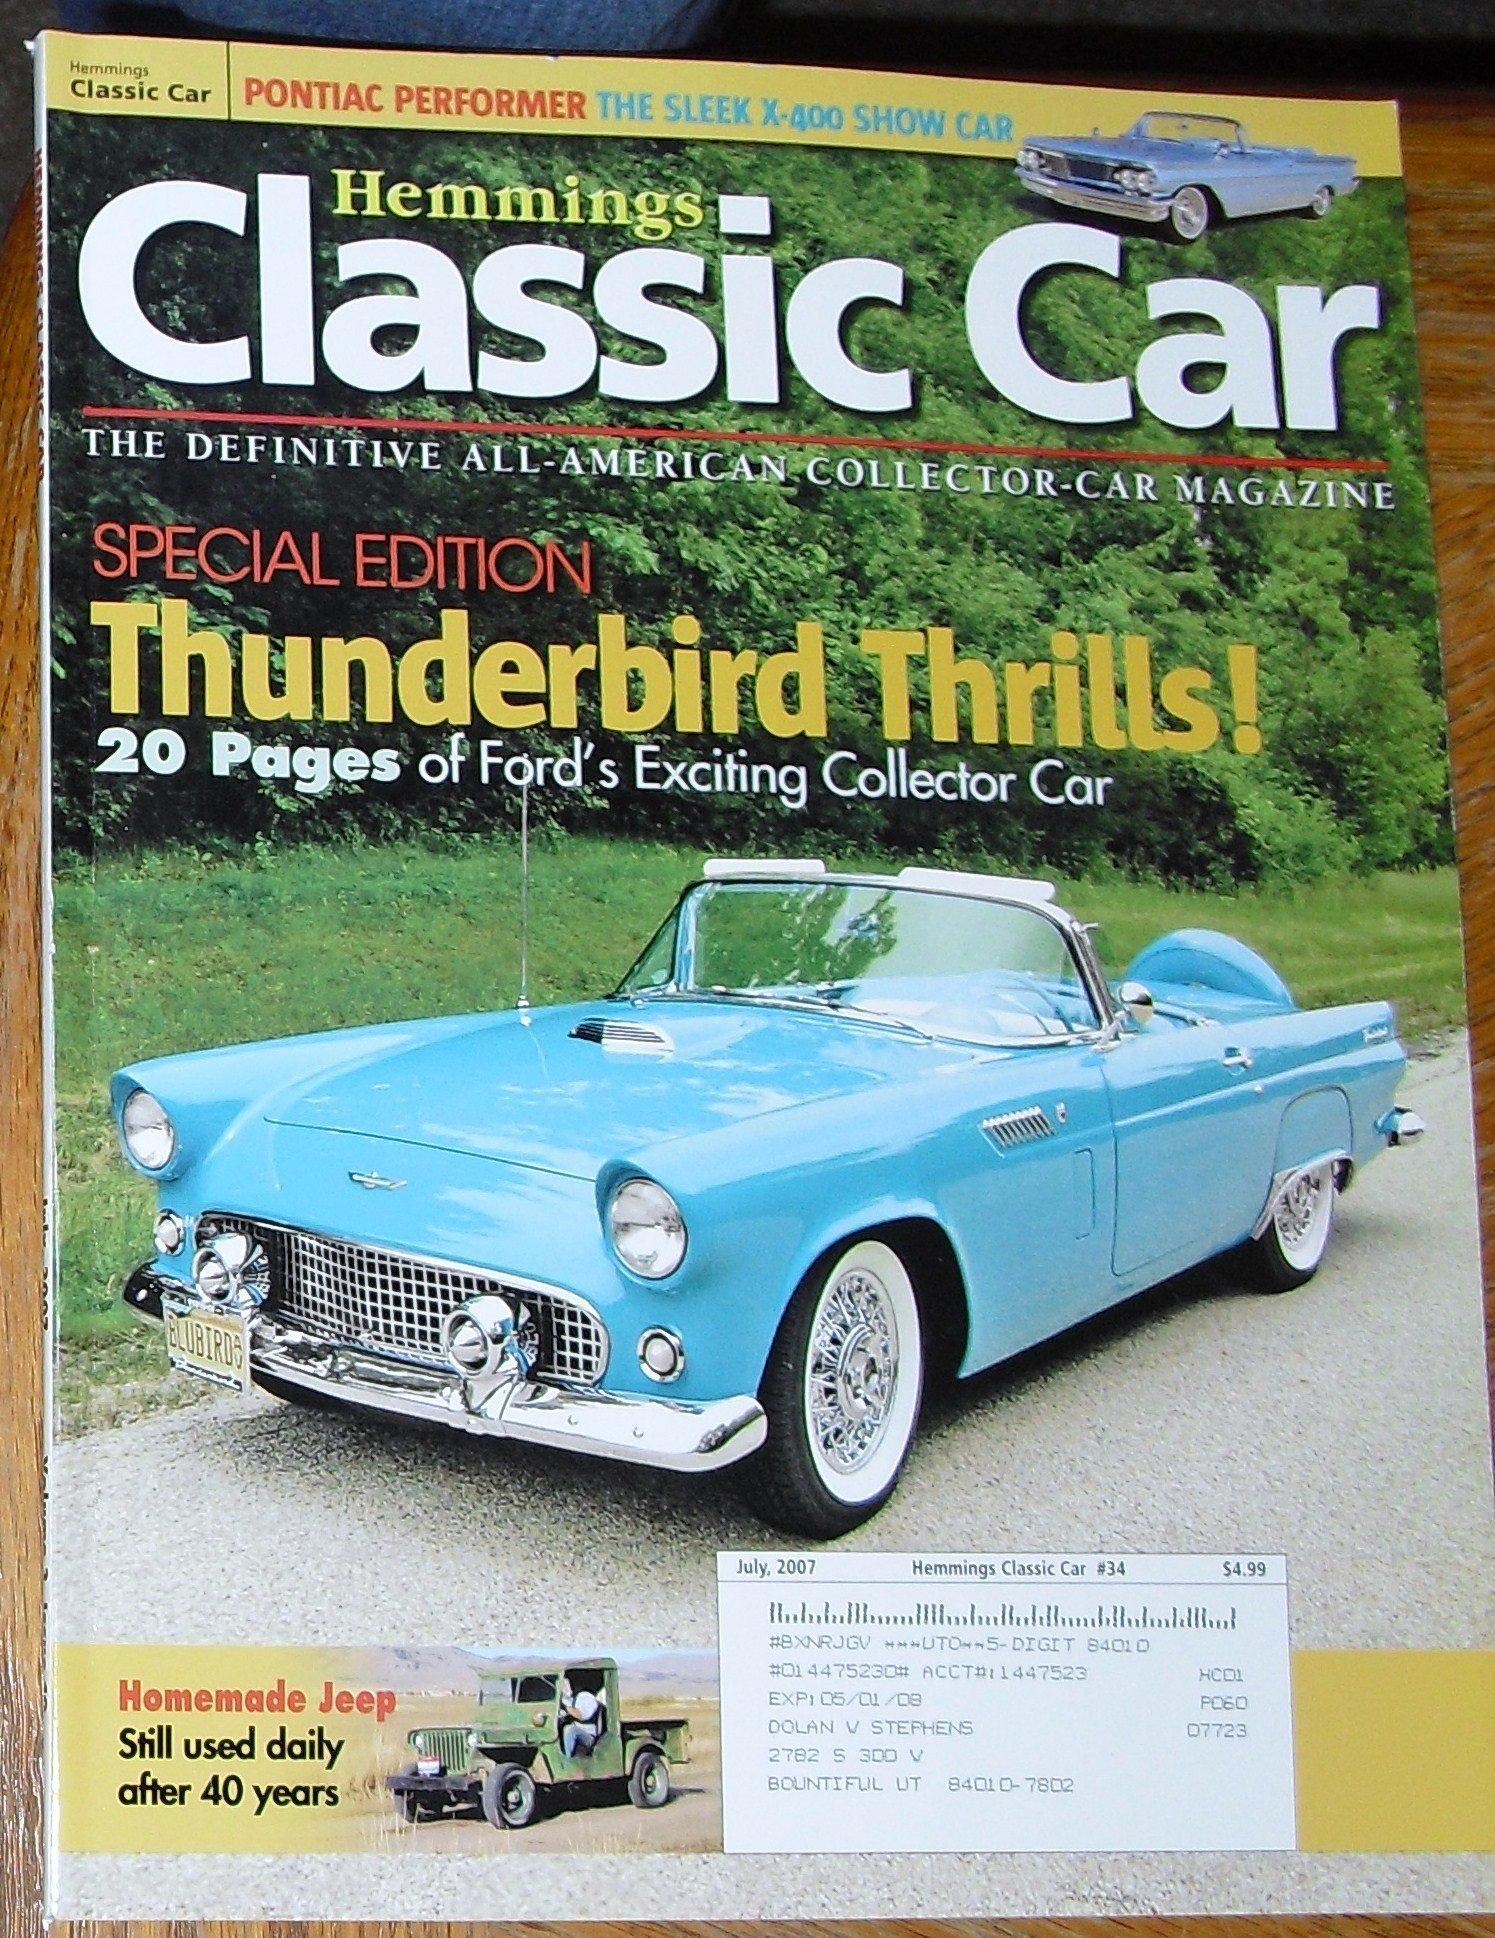 Hemmings Classic Car Magazine, July 2007: Amazon.com: Books